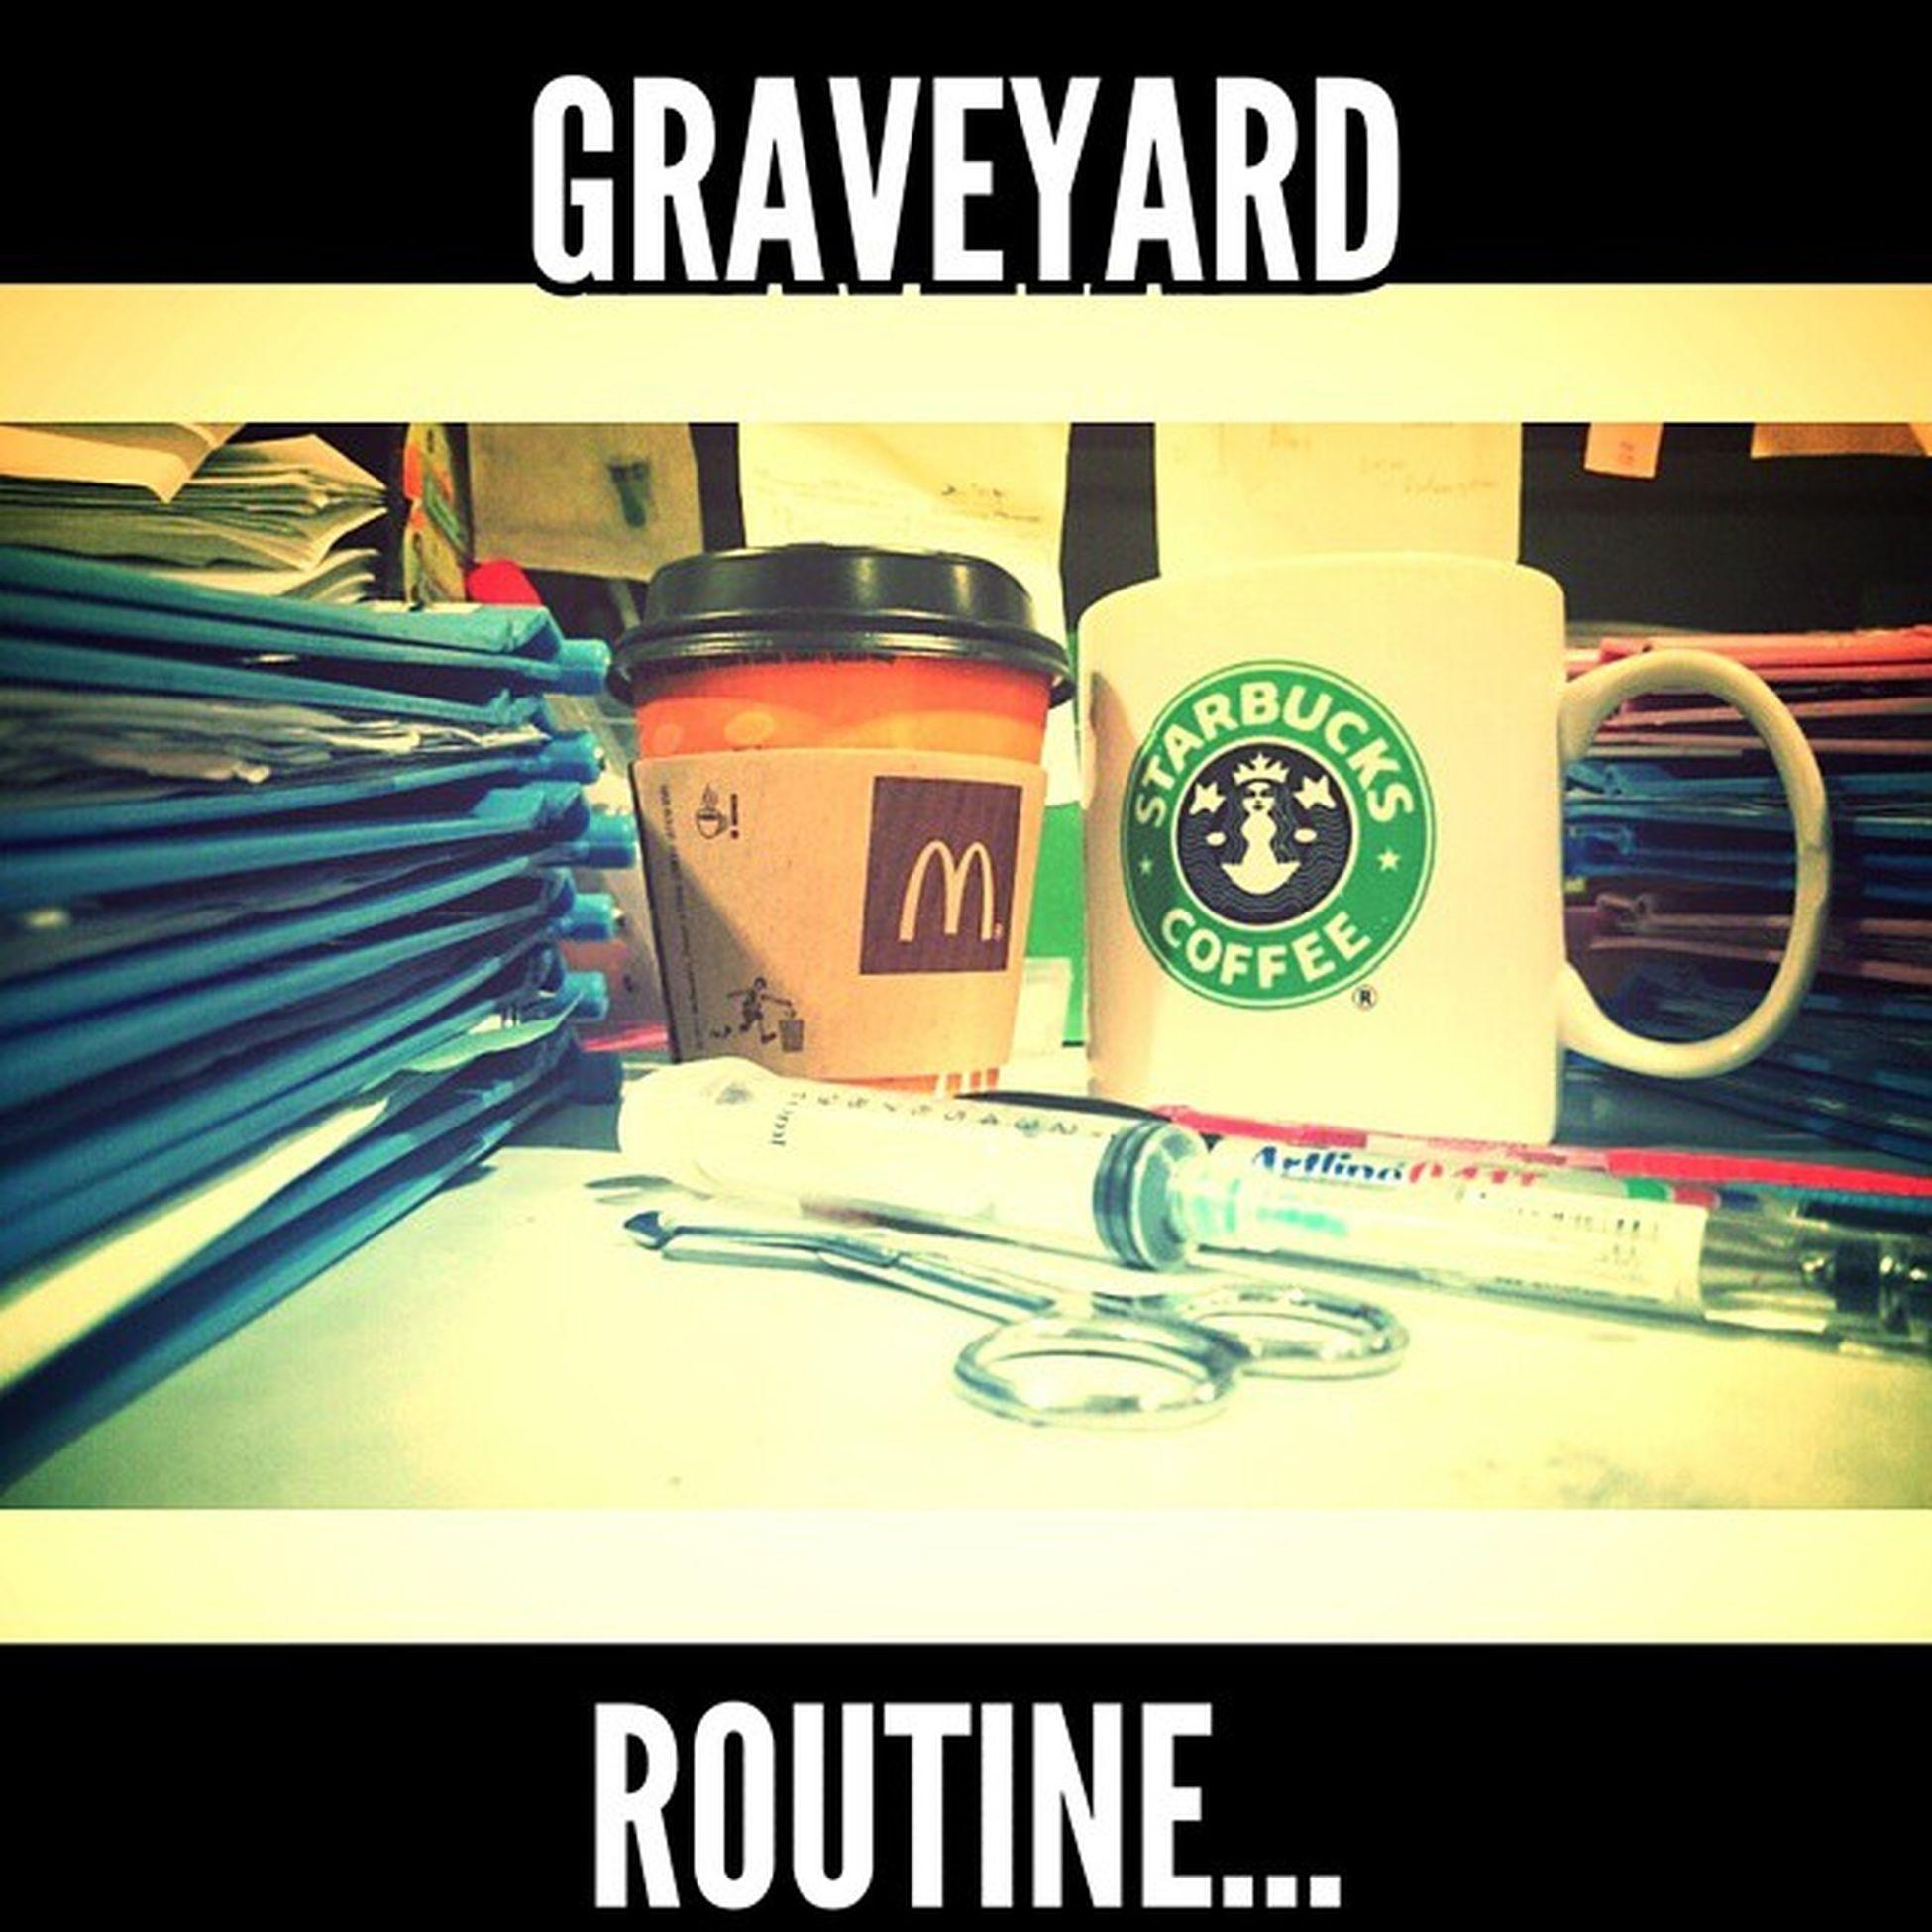 Graveyard Routine. Aviary NOD Graveyardmania Coffeebreaky Alert